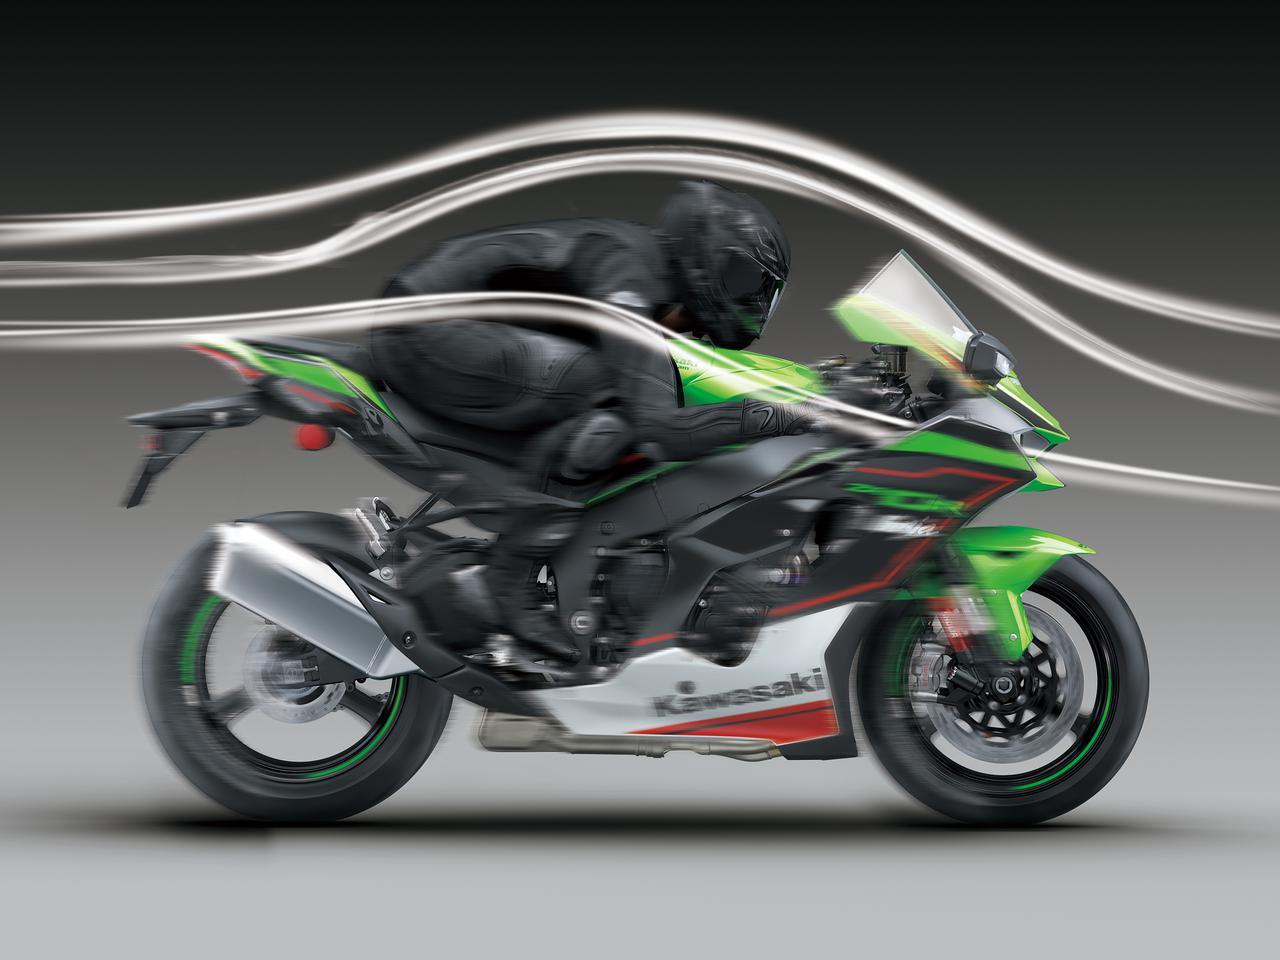 Images : 13番目の画像 - 【写真36枚】カワサキ 新型 Ninja ZX-10R/Ninja ZX-10RR - webオートバイ